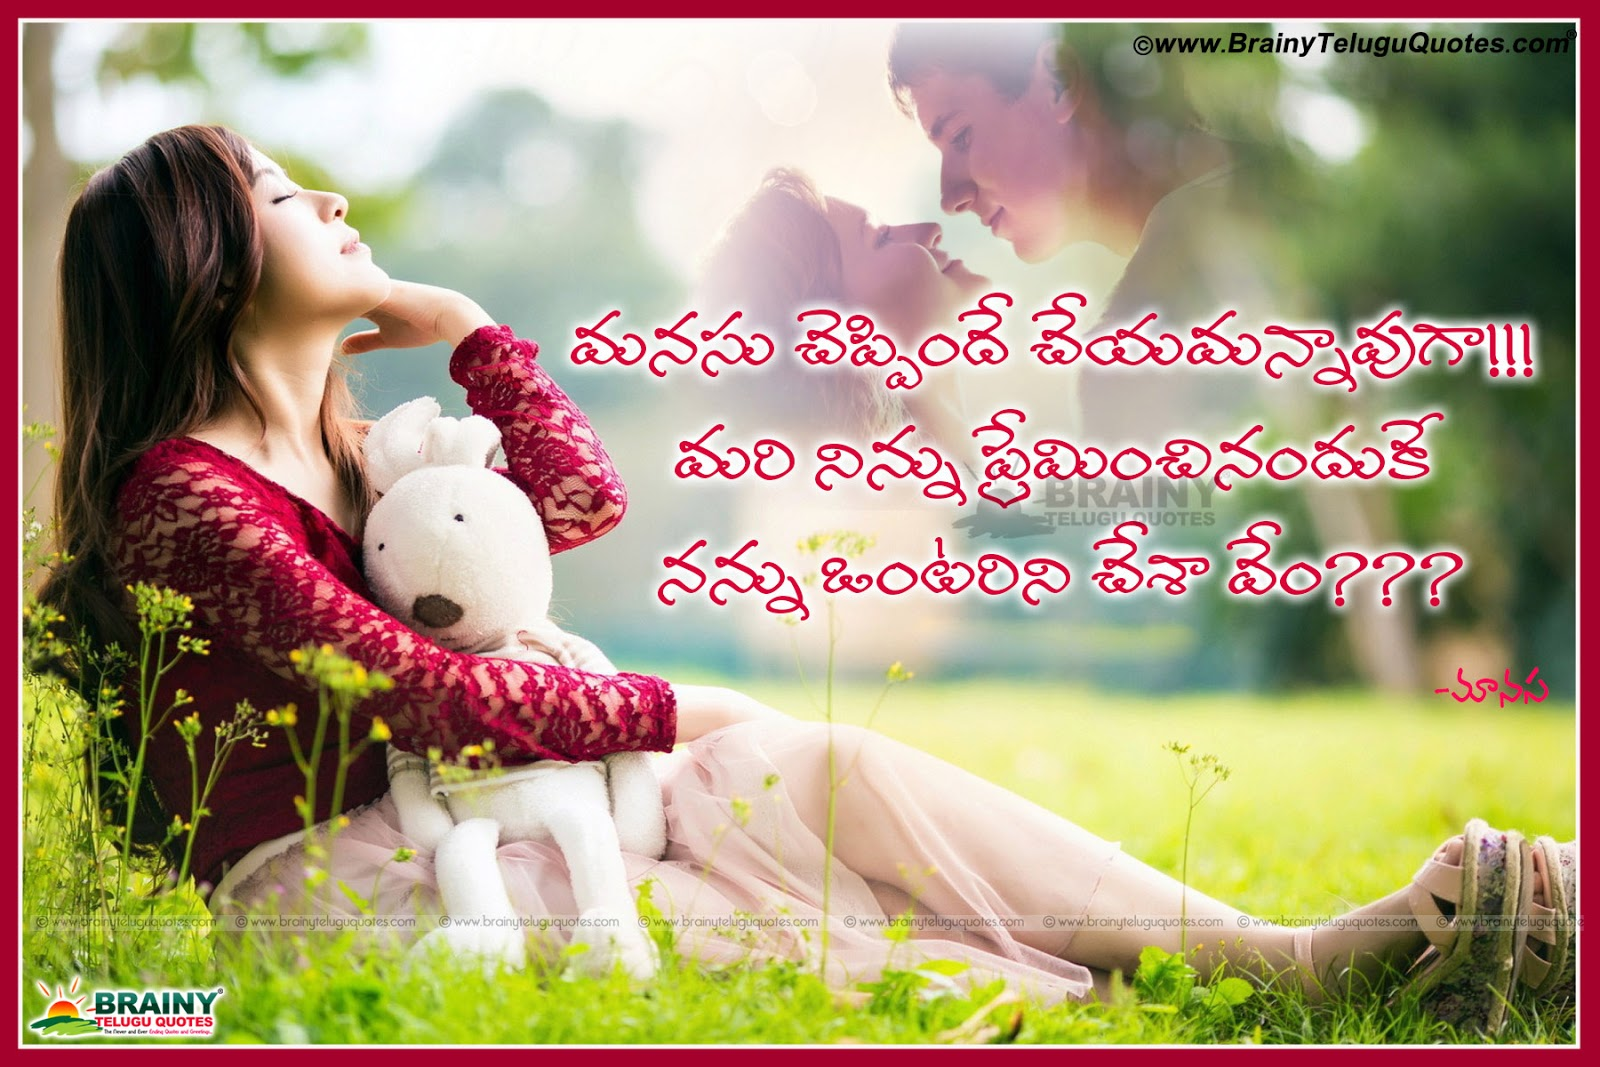 telugu latest love failure quotations with alone girl